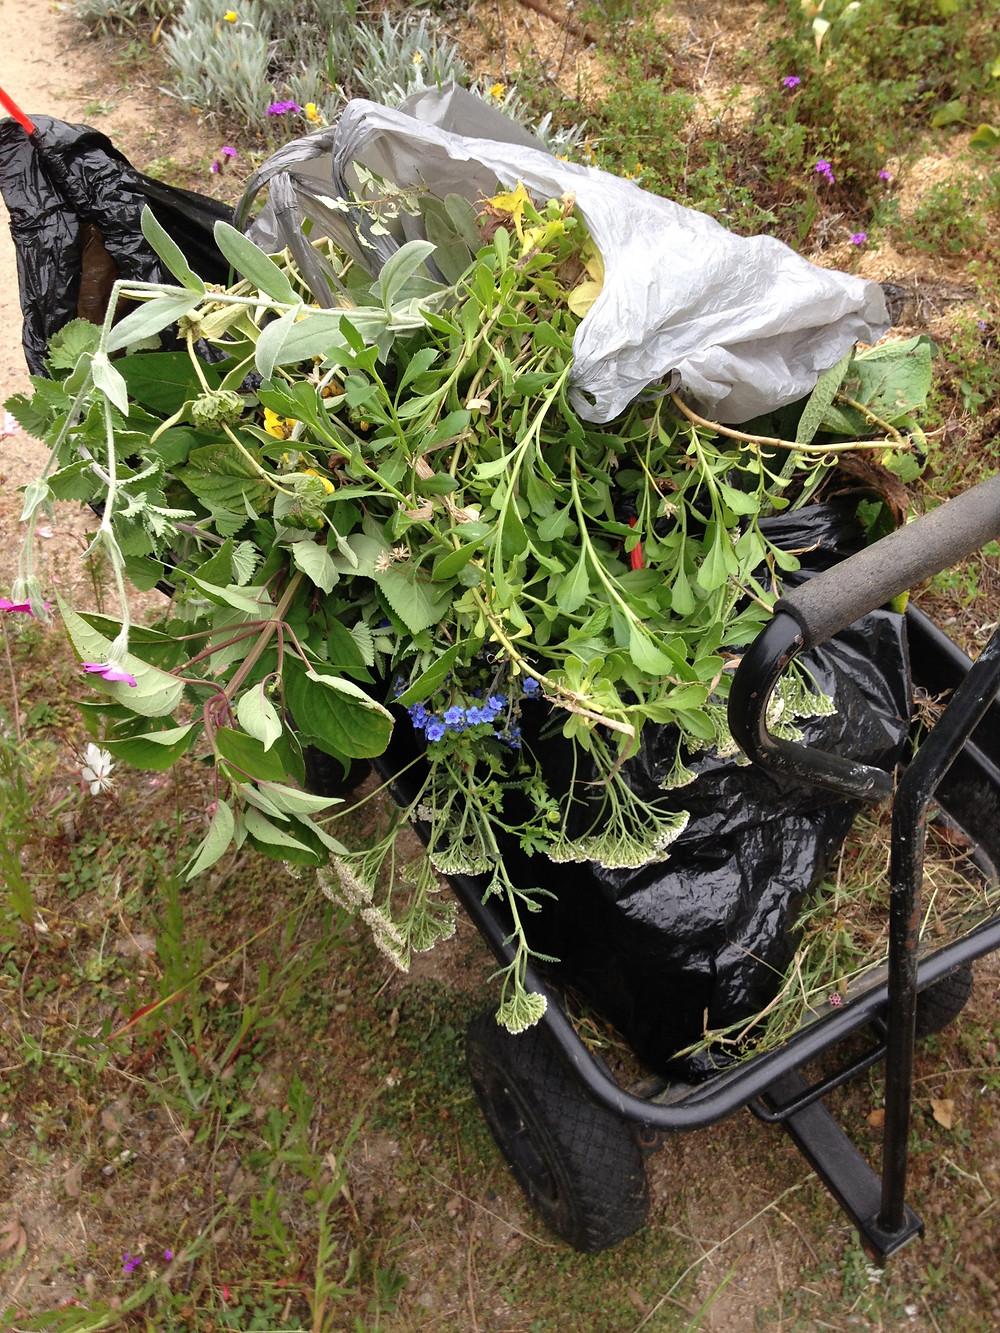 Wheelbarrow full of plant bits